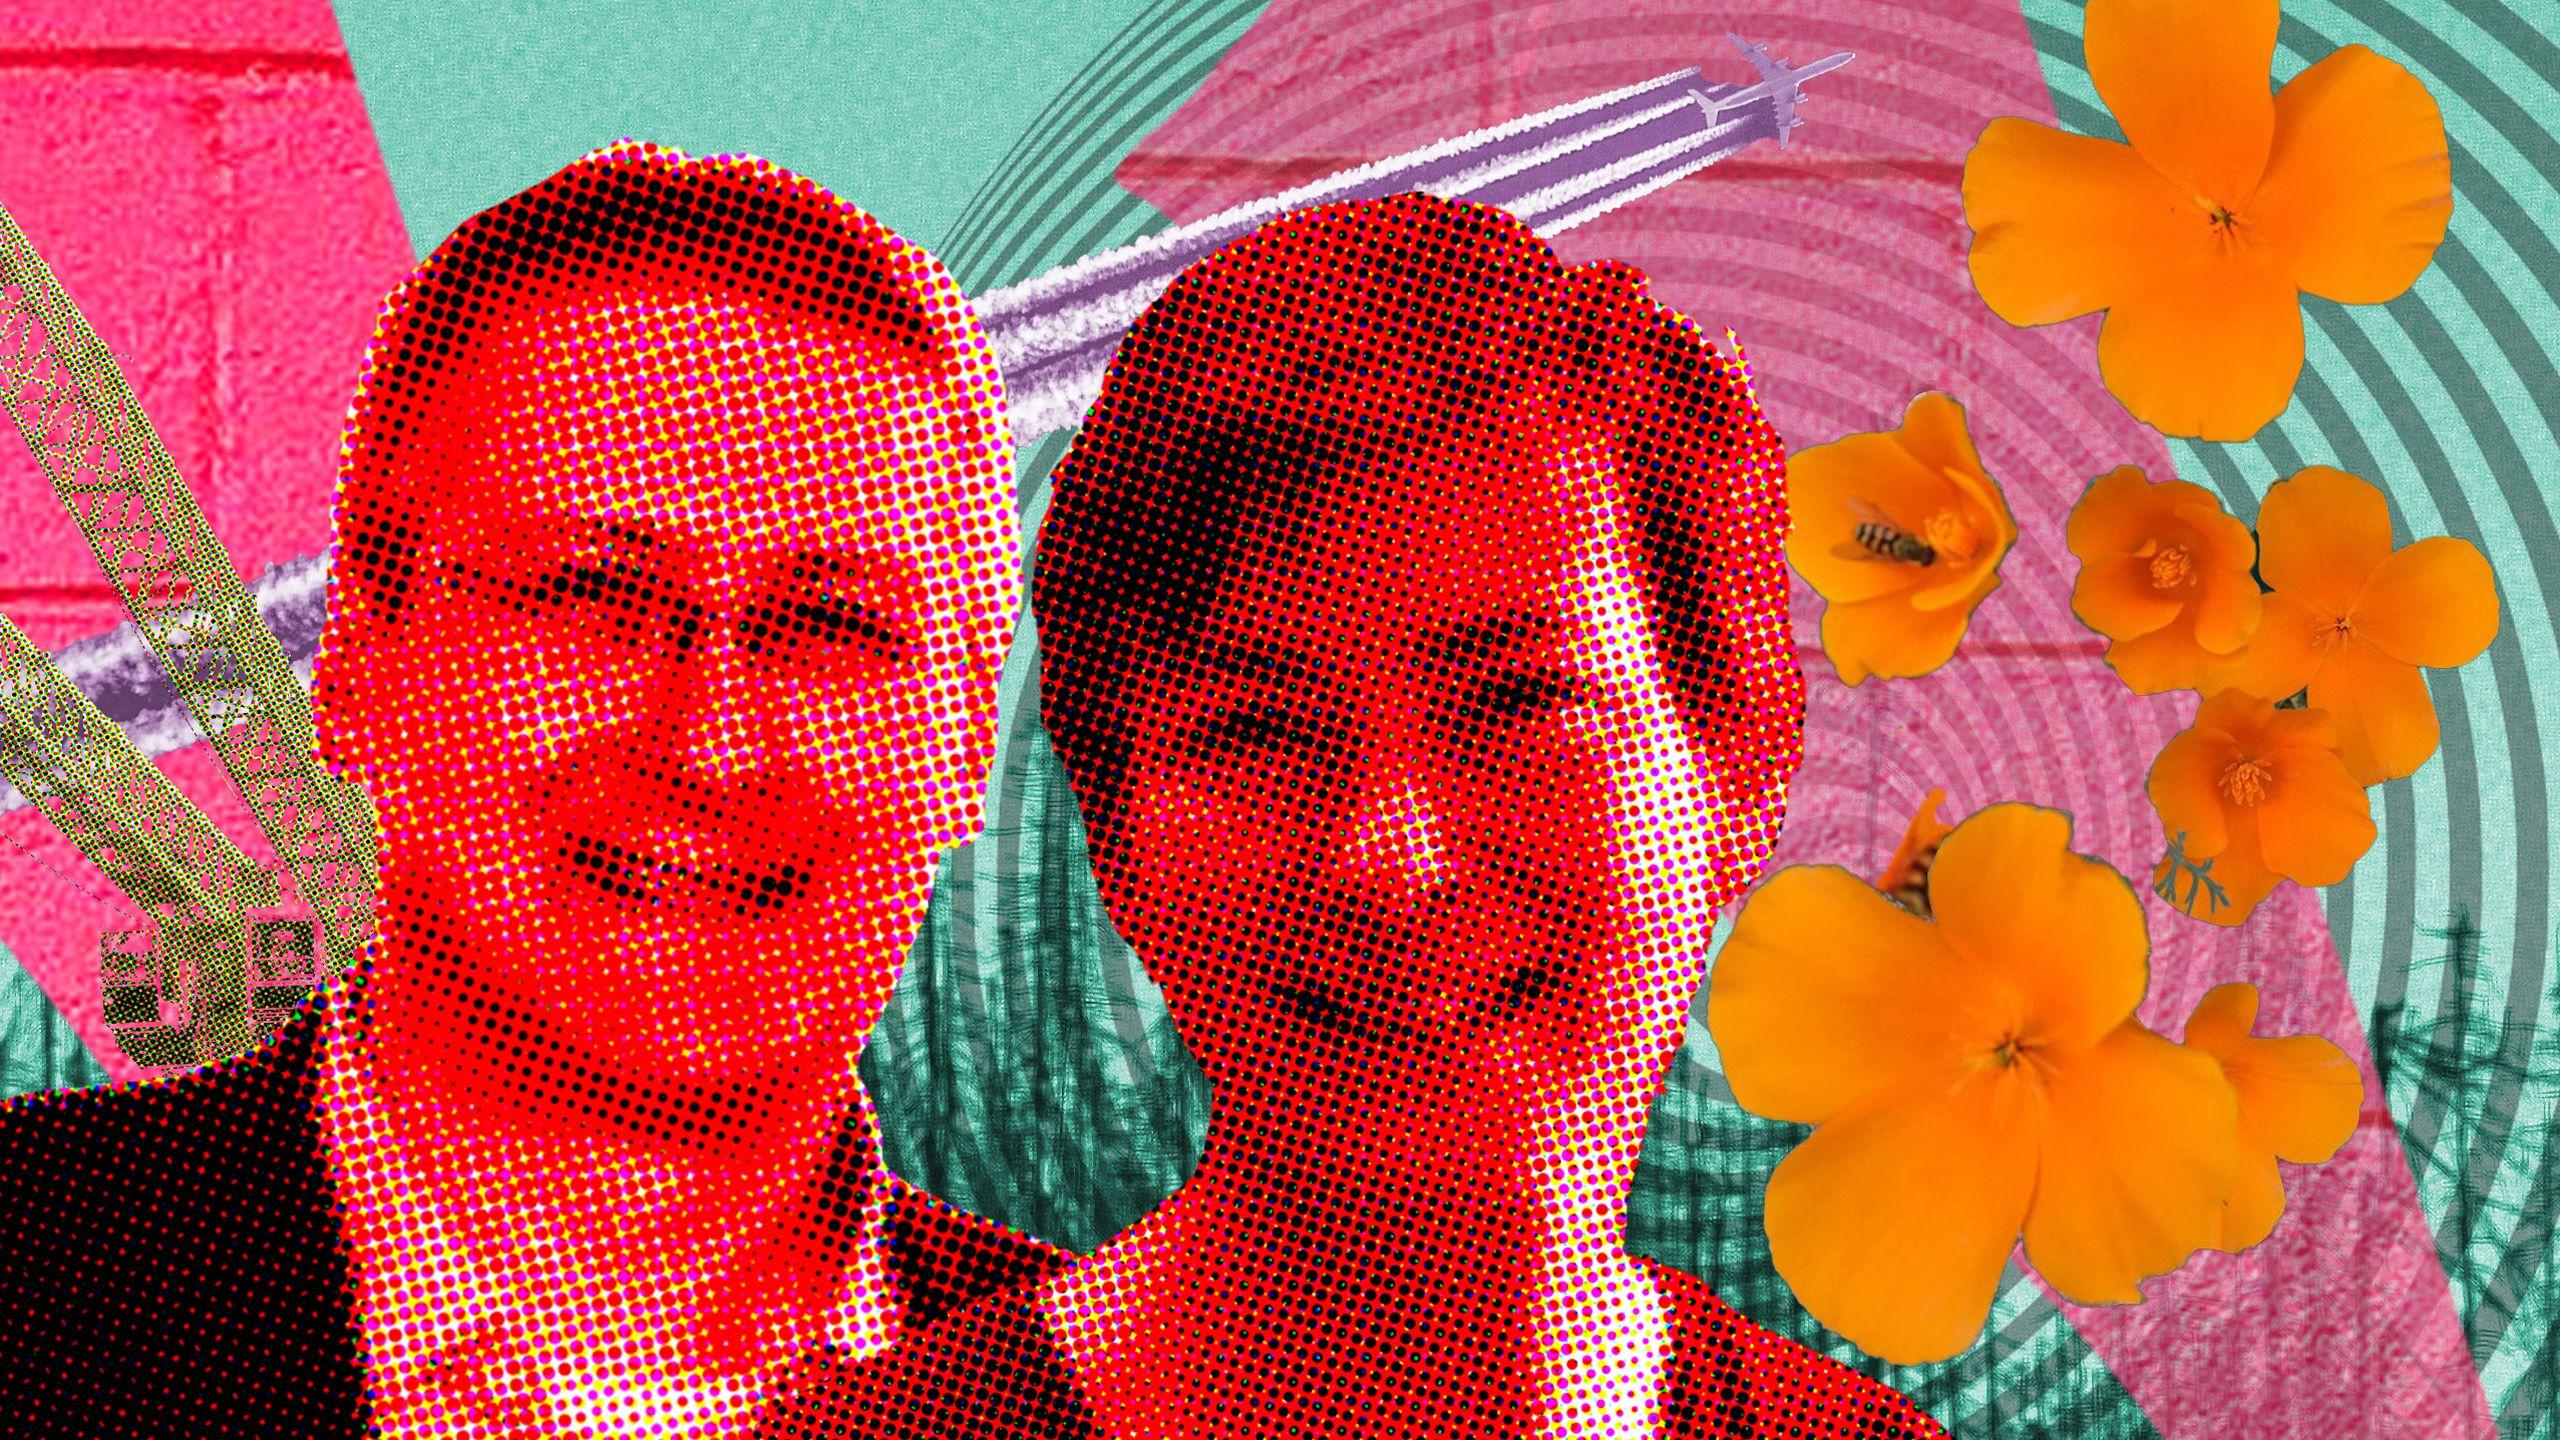 John Clarkson and Carol Brayne